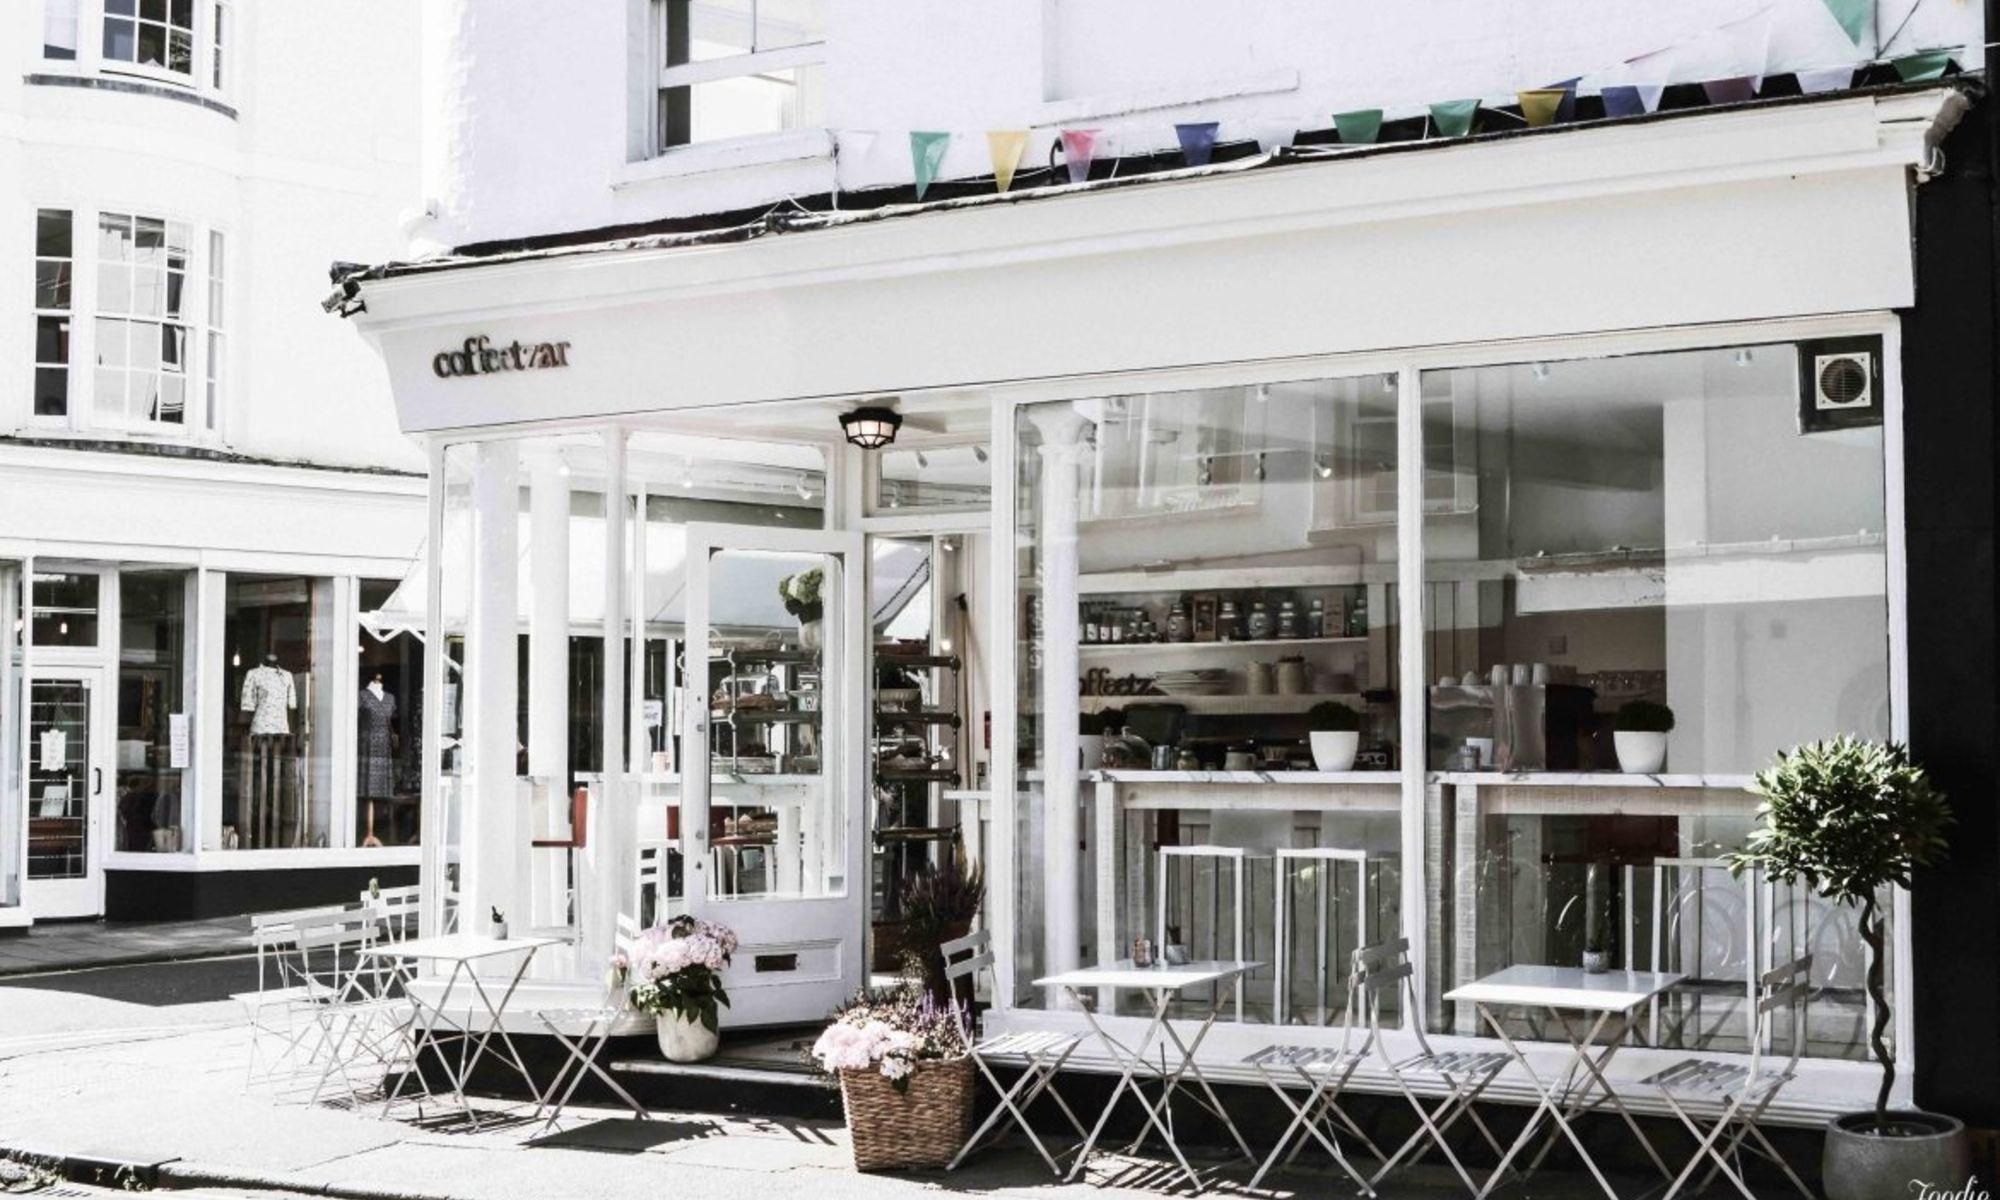 Coffeetzar study place Brighton